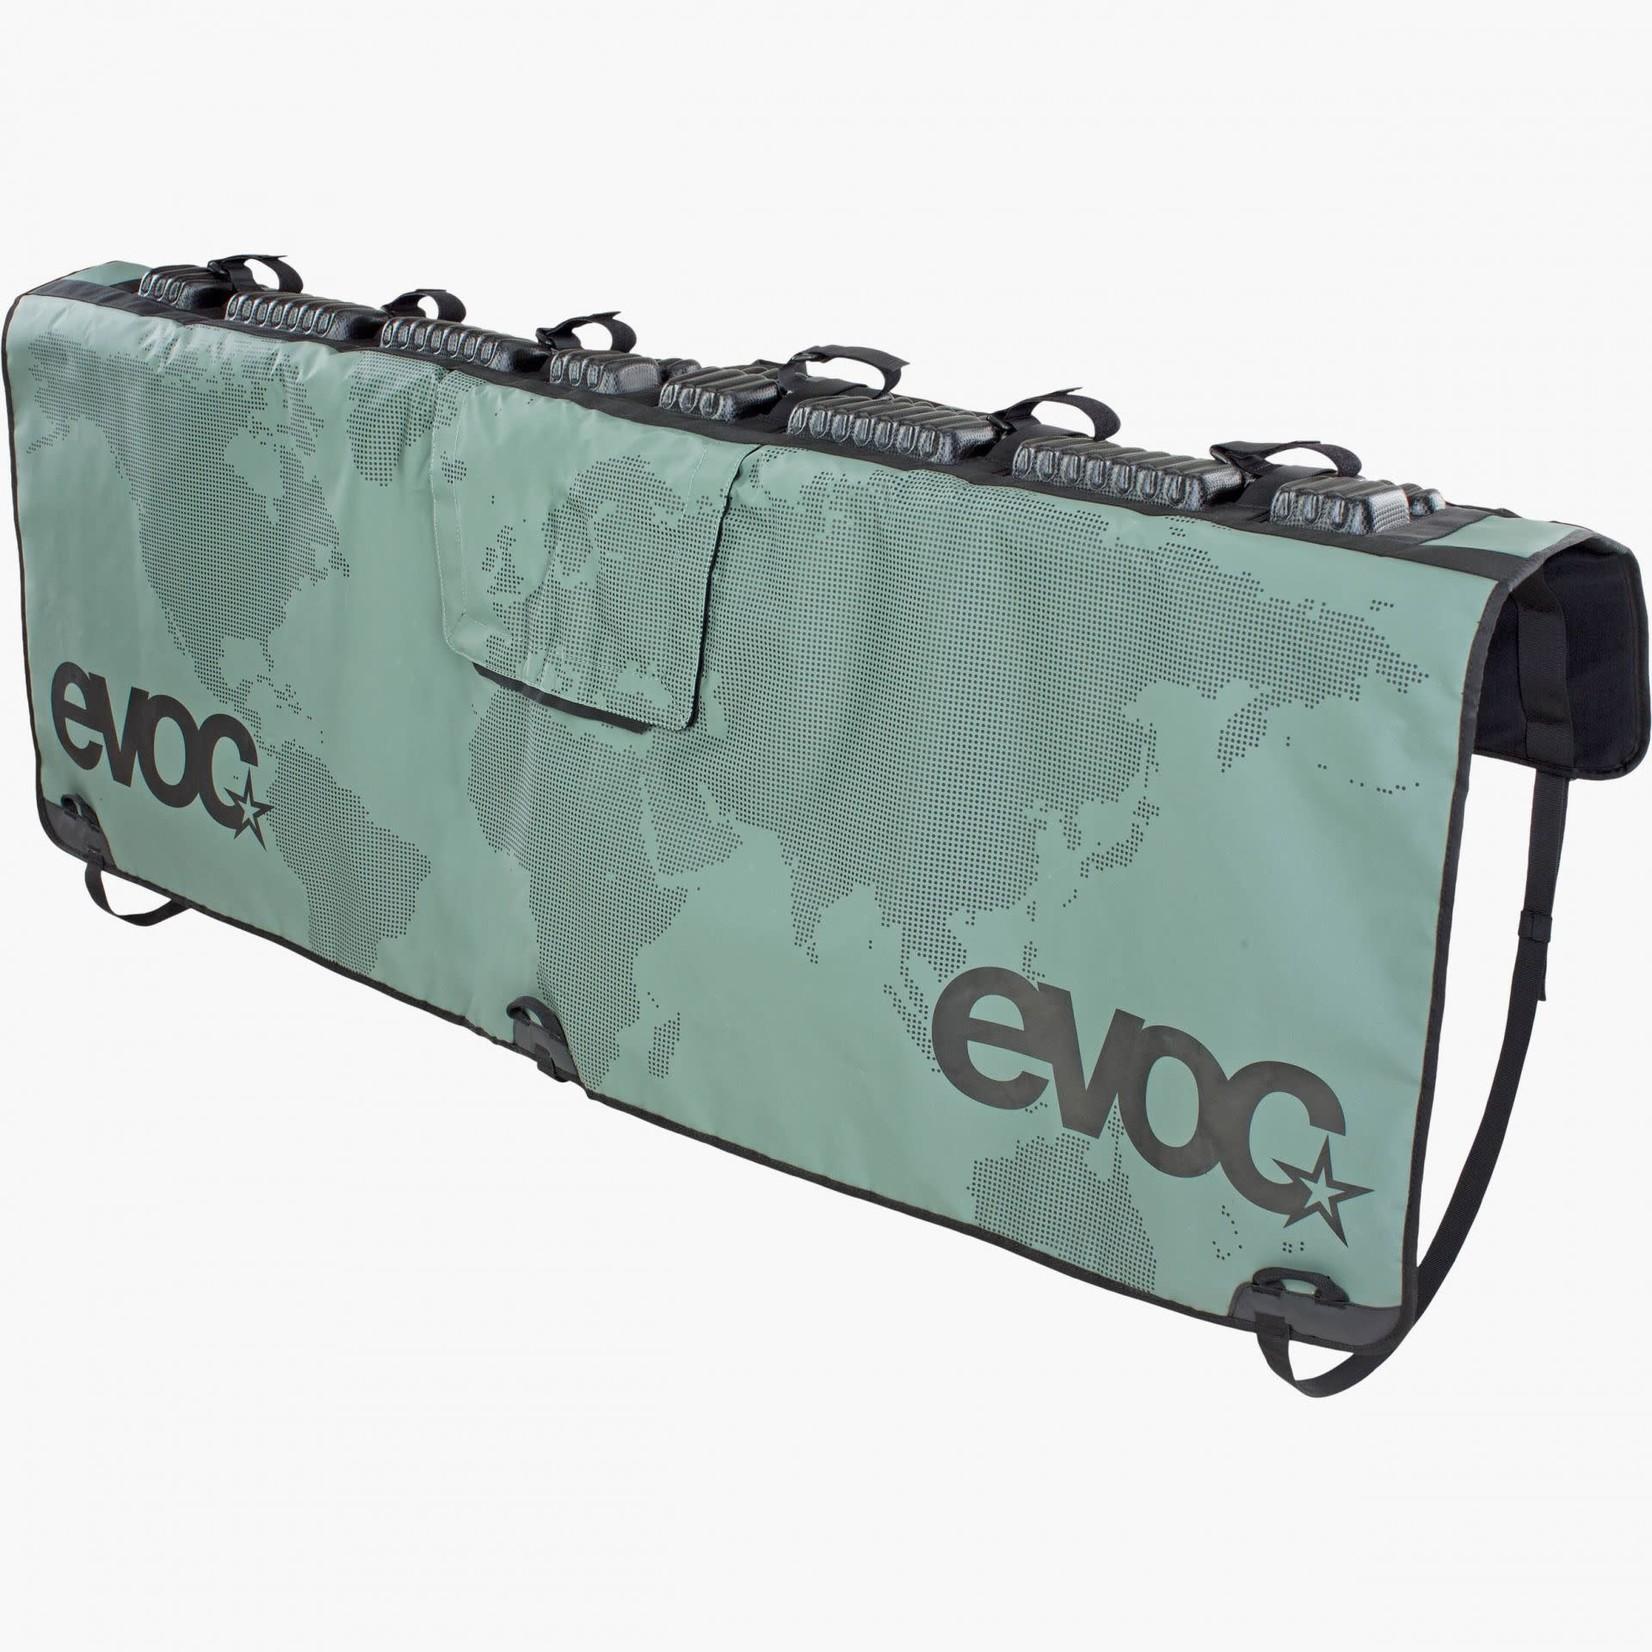 EVOC EVOC, Tailgate Pad, 136cm / 53.5'' wide, for mid-sized trucks, Olive